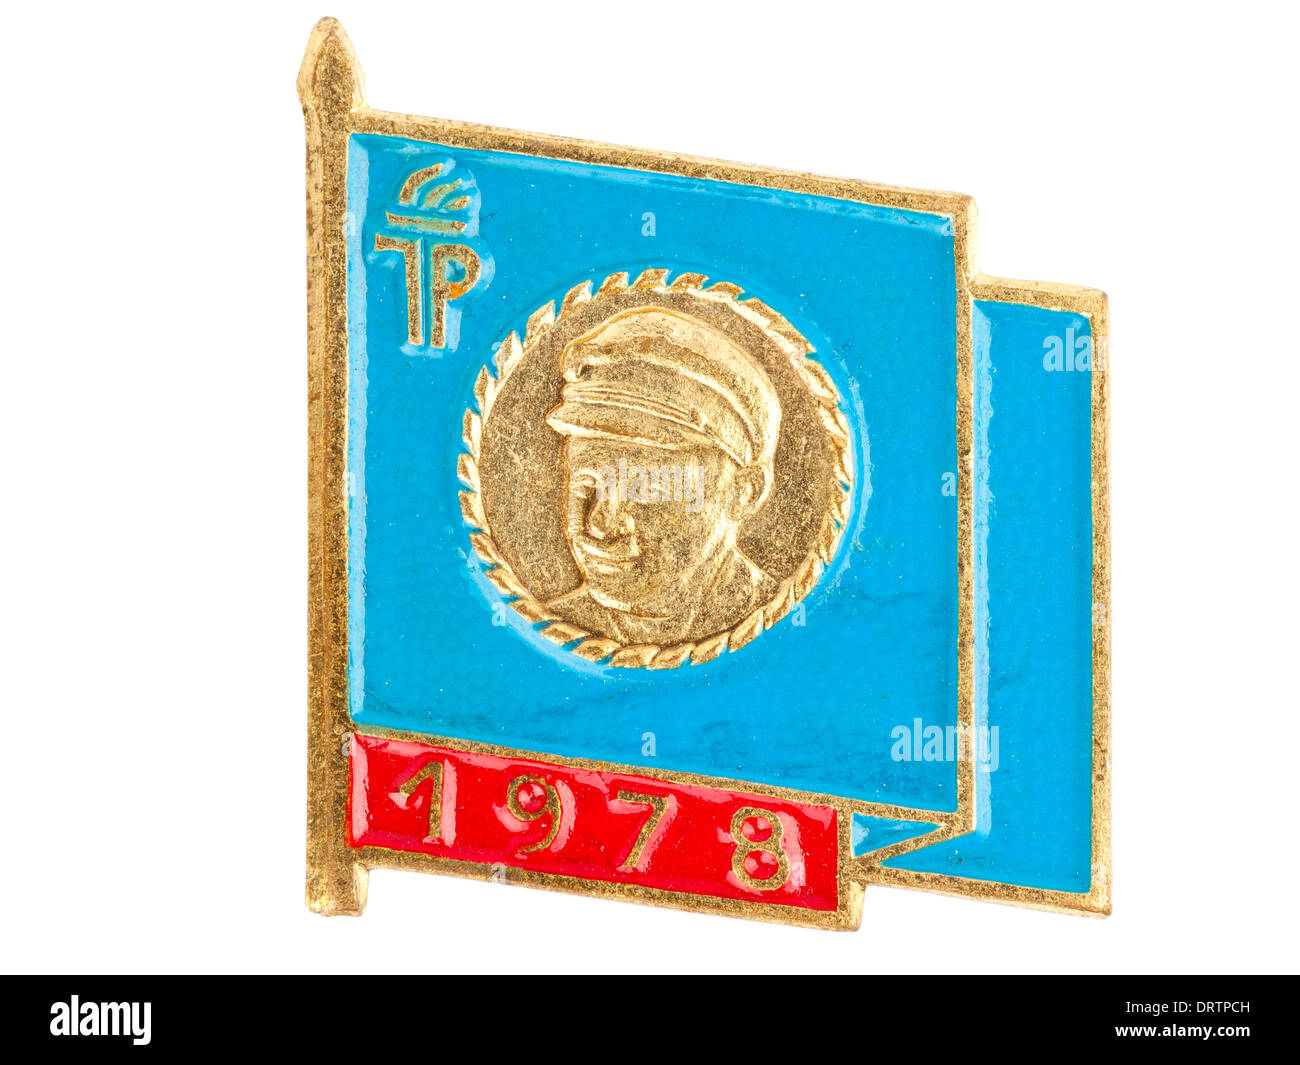 Rda (DDR) grupo de jovens (Junge Pioniere) badge - 1978 Imagens de Stock